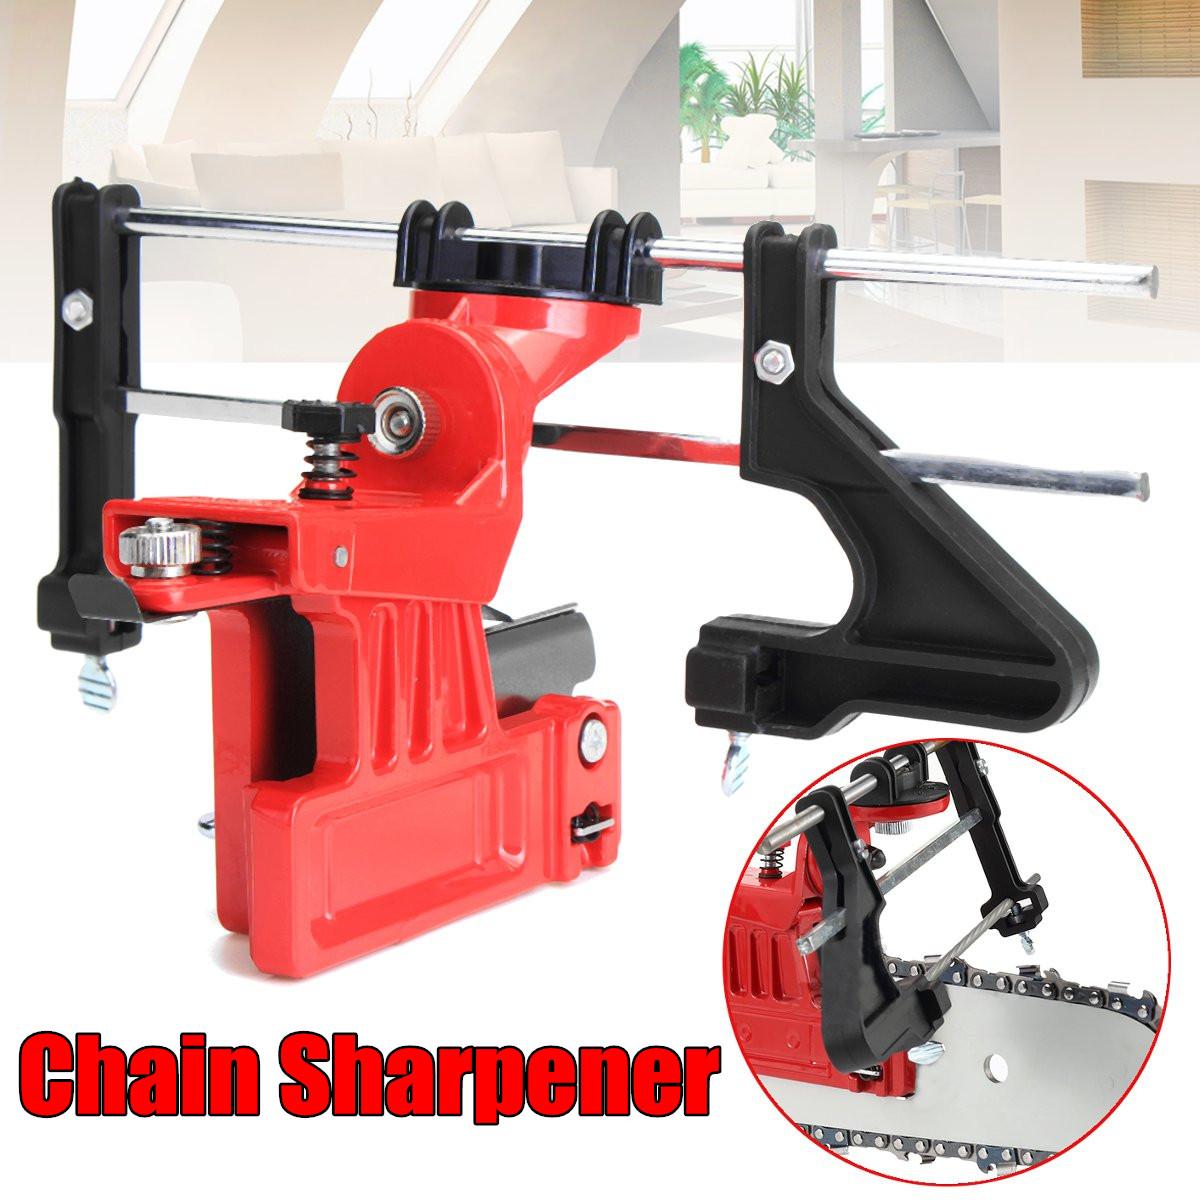 Professional Filing Guide Tecomec Super Rapid Chainsaw Sharpening File Chain Sharpener Tools Kit